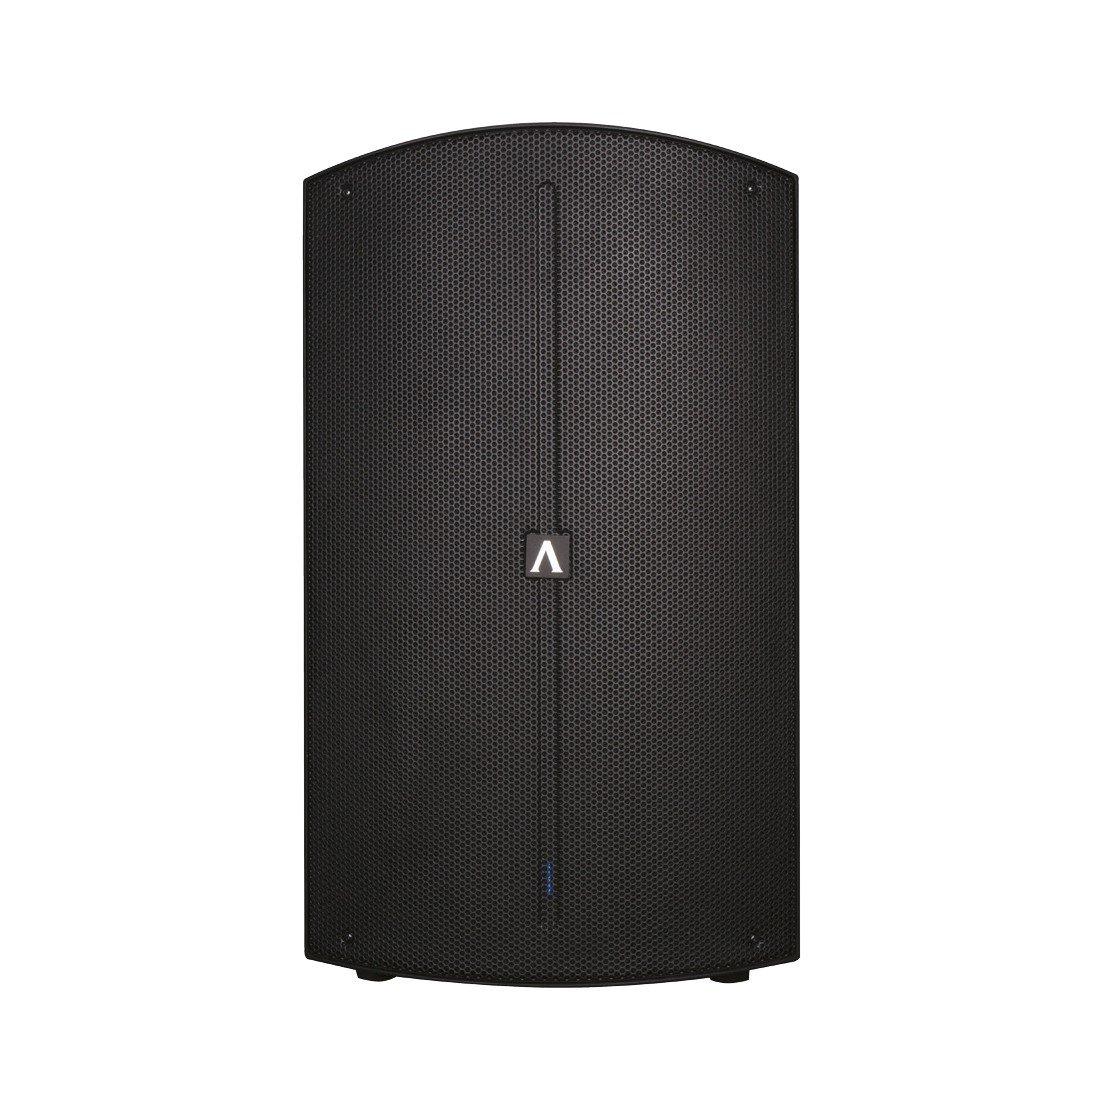 Avante A15 15'' 2 Way Active PA Speaker, 15 inch Powered by Avante